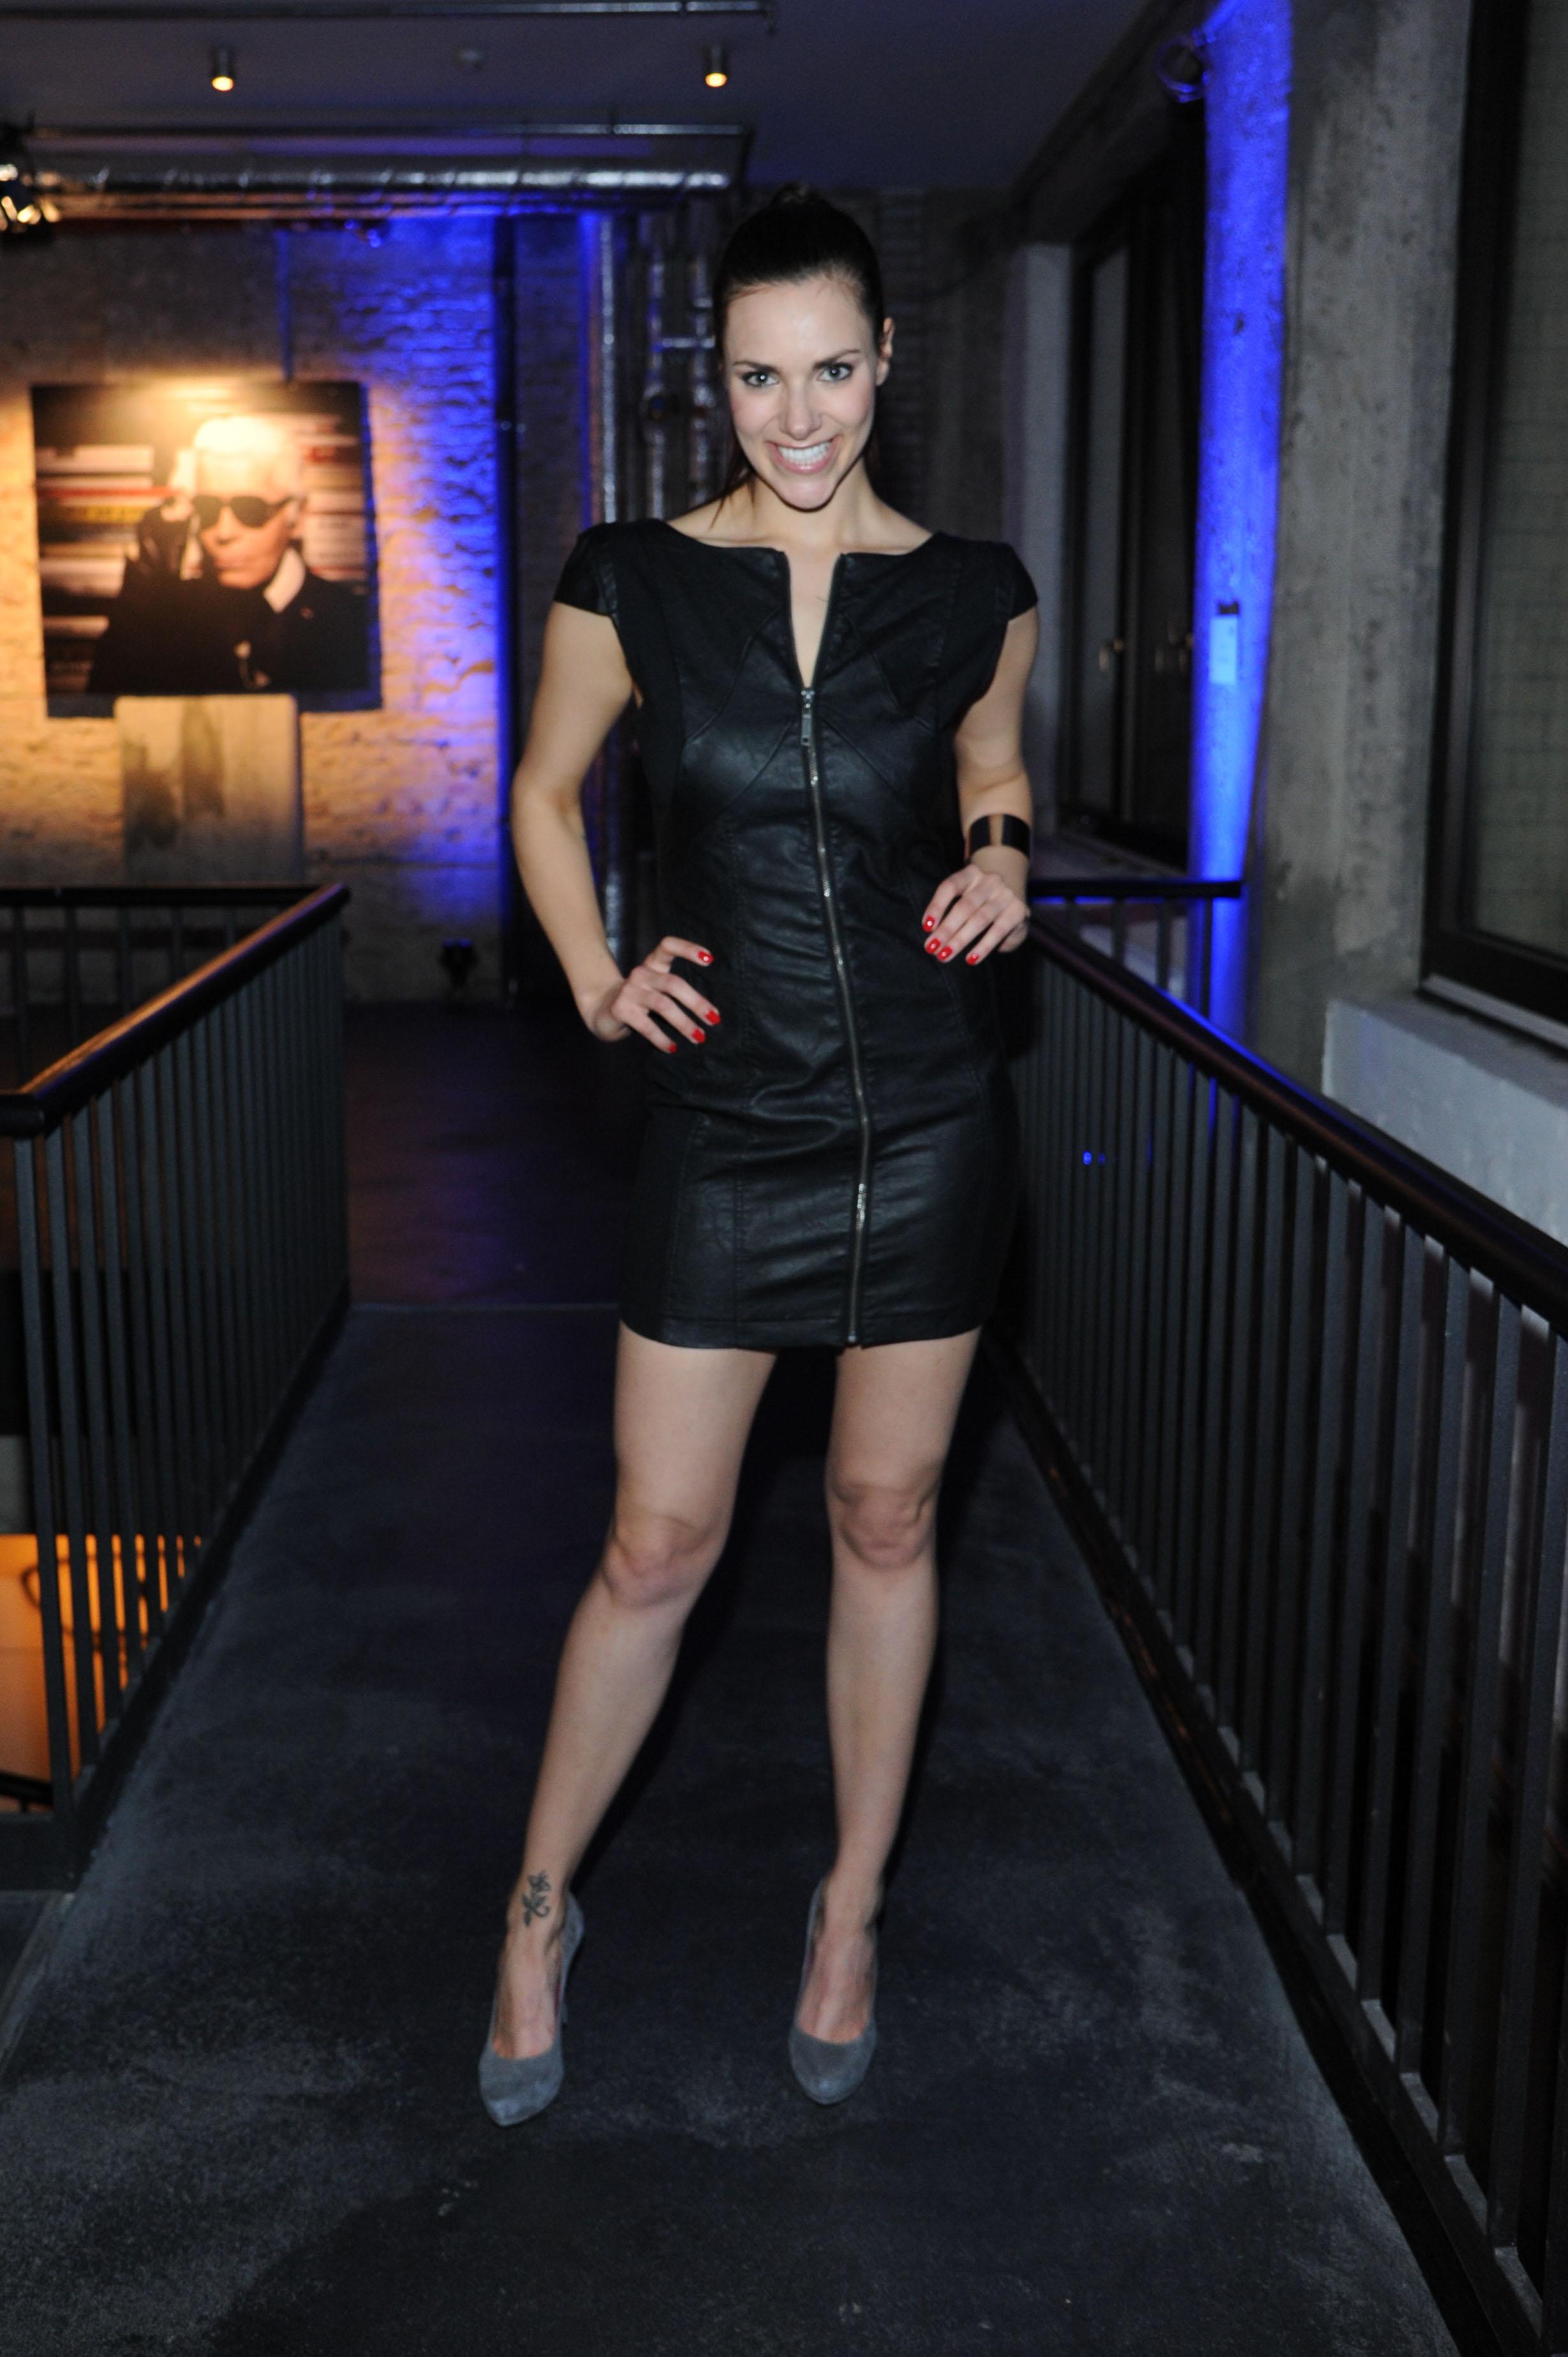 idol celebs com Esther Sedlaczek 110407 09